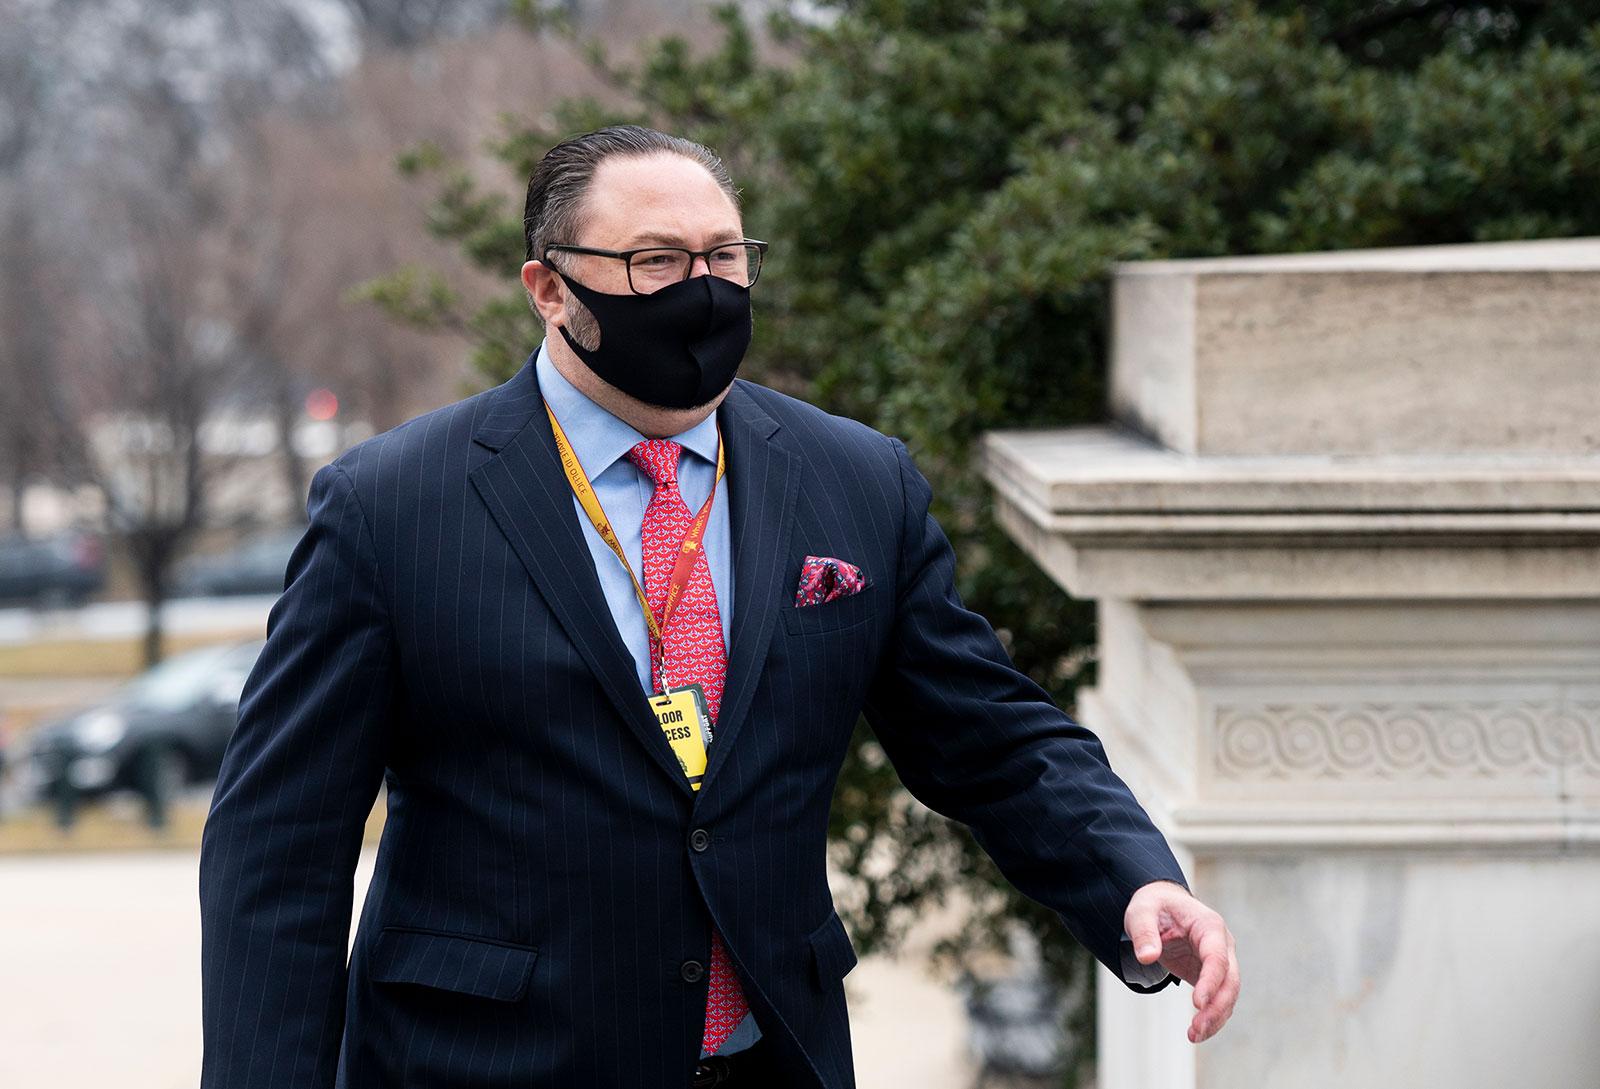 Jason Miller arrives at the Capitol on Thursday, February 11.